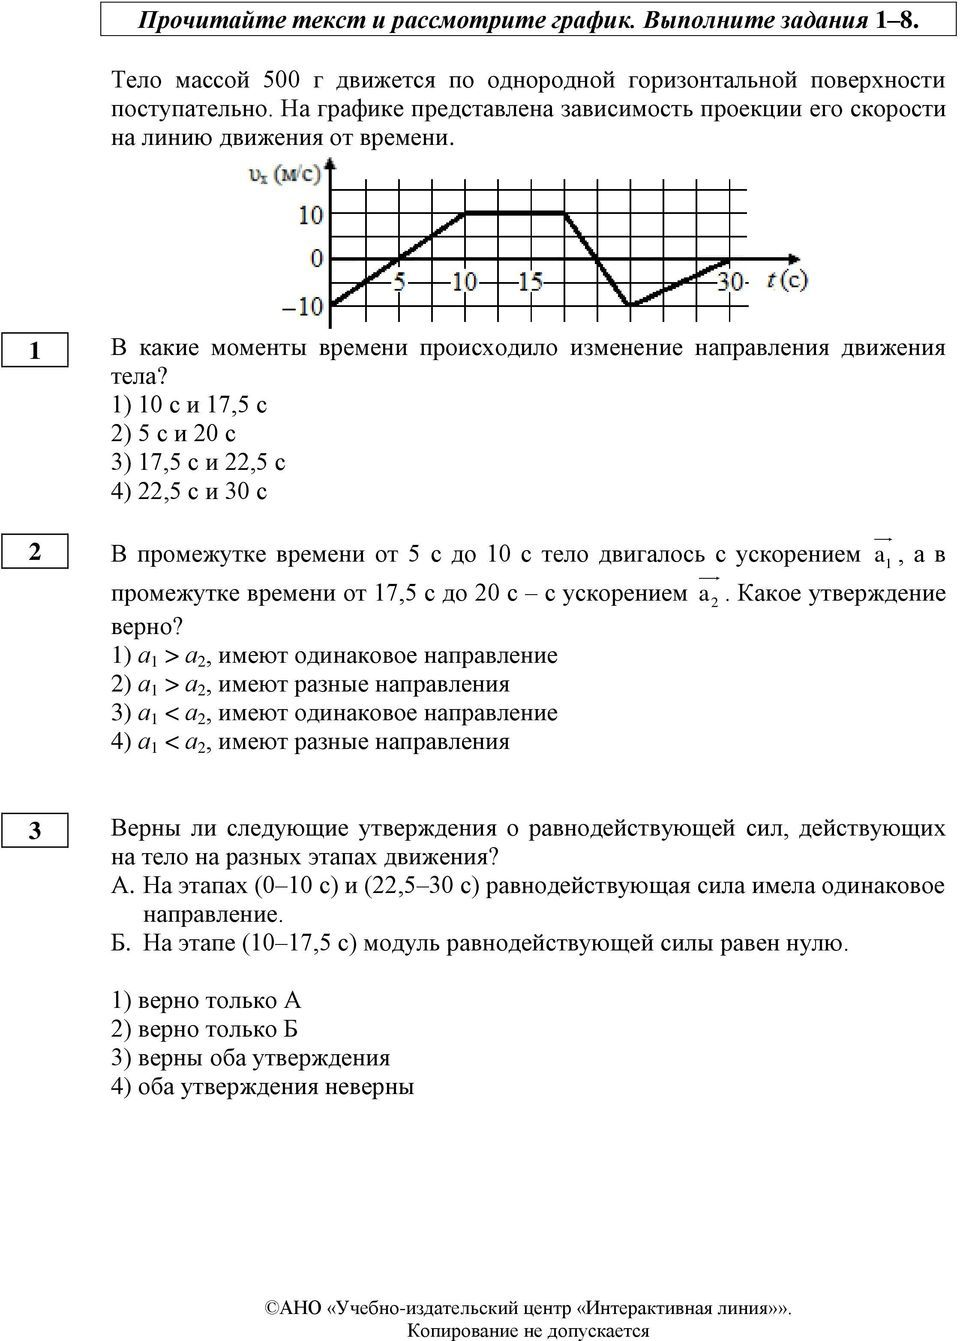 Программа факультатива по информатике 5 класс